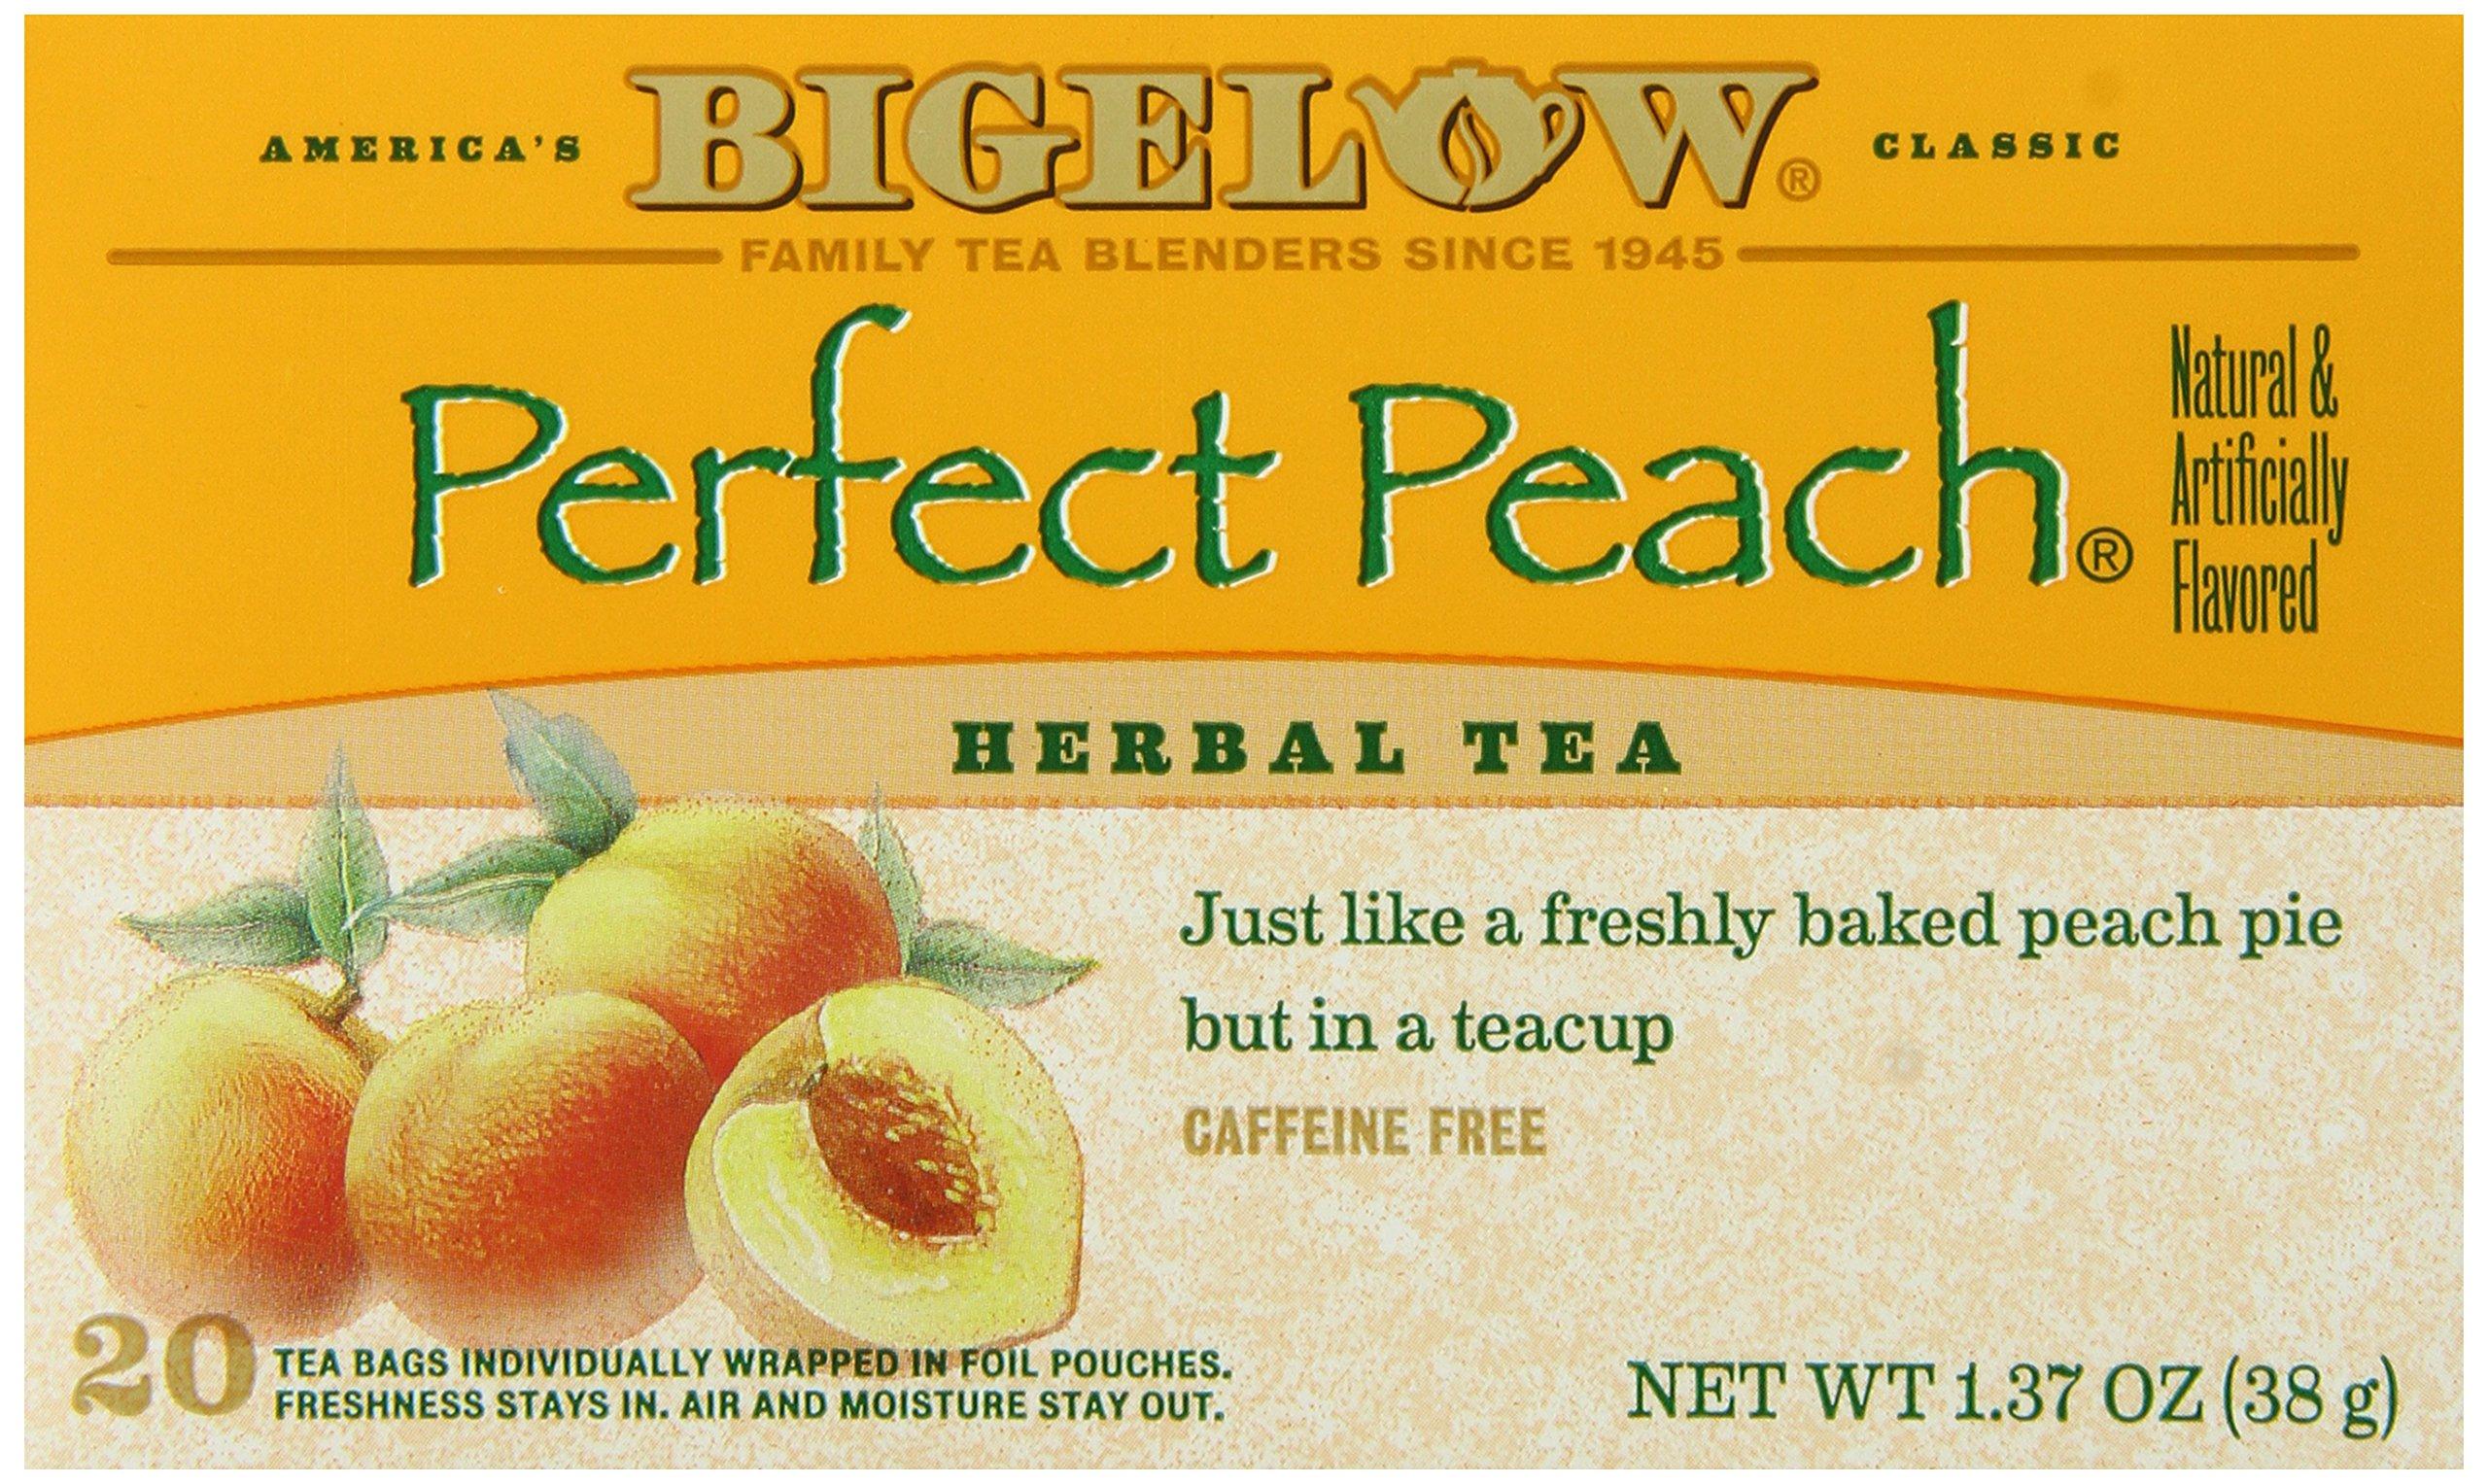 Bigelow herbal tea - Bigelow Perfect Peach Herbal Tea 20 Count Boxes Pack Of 6